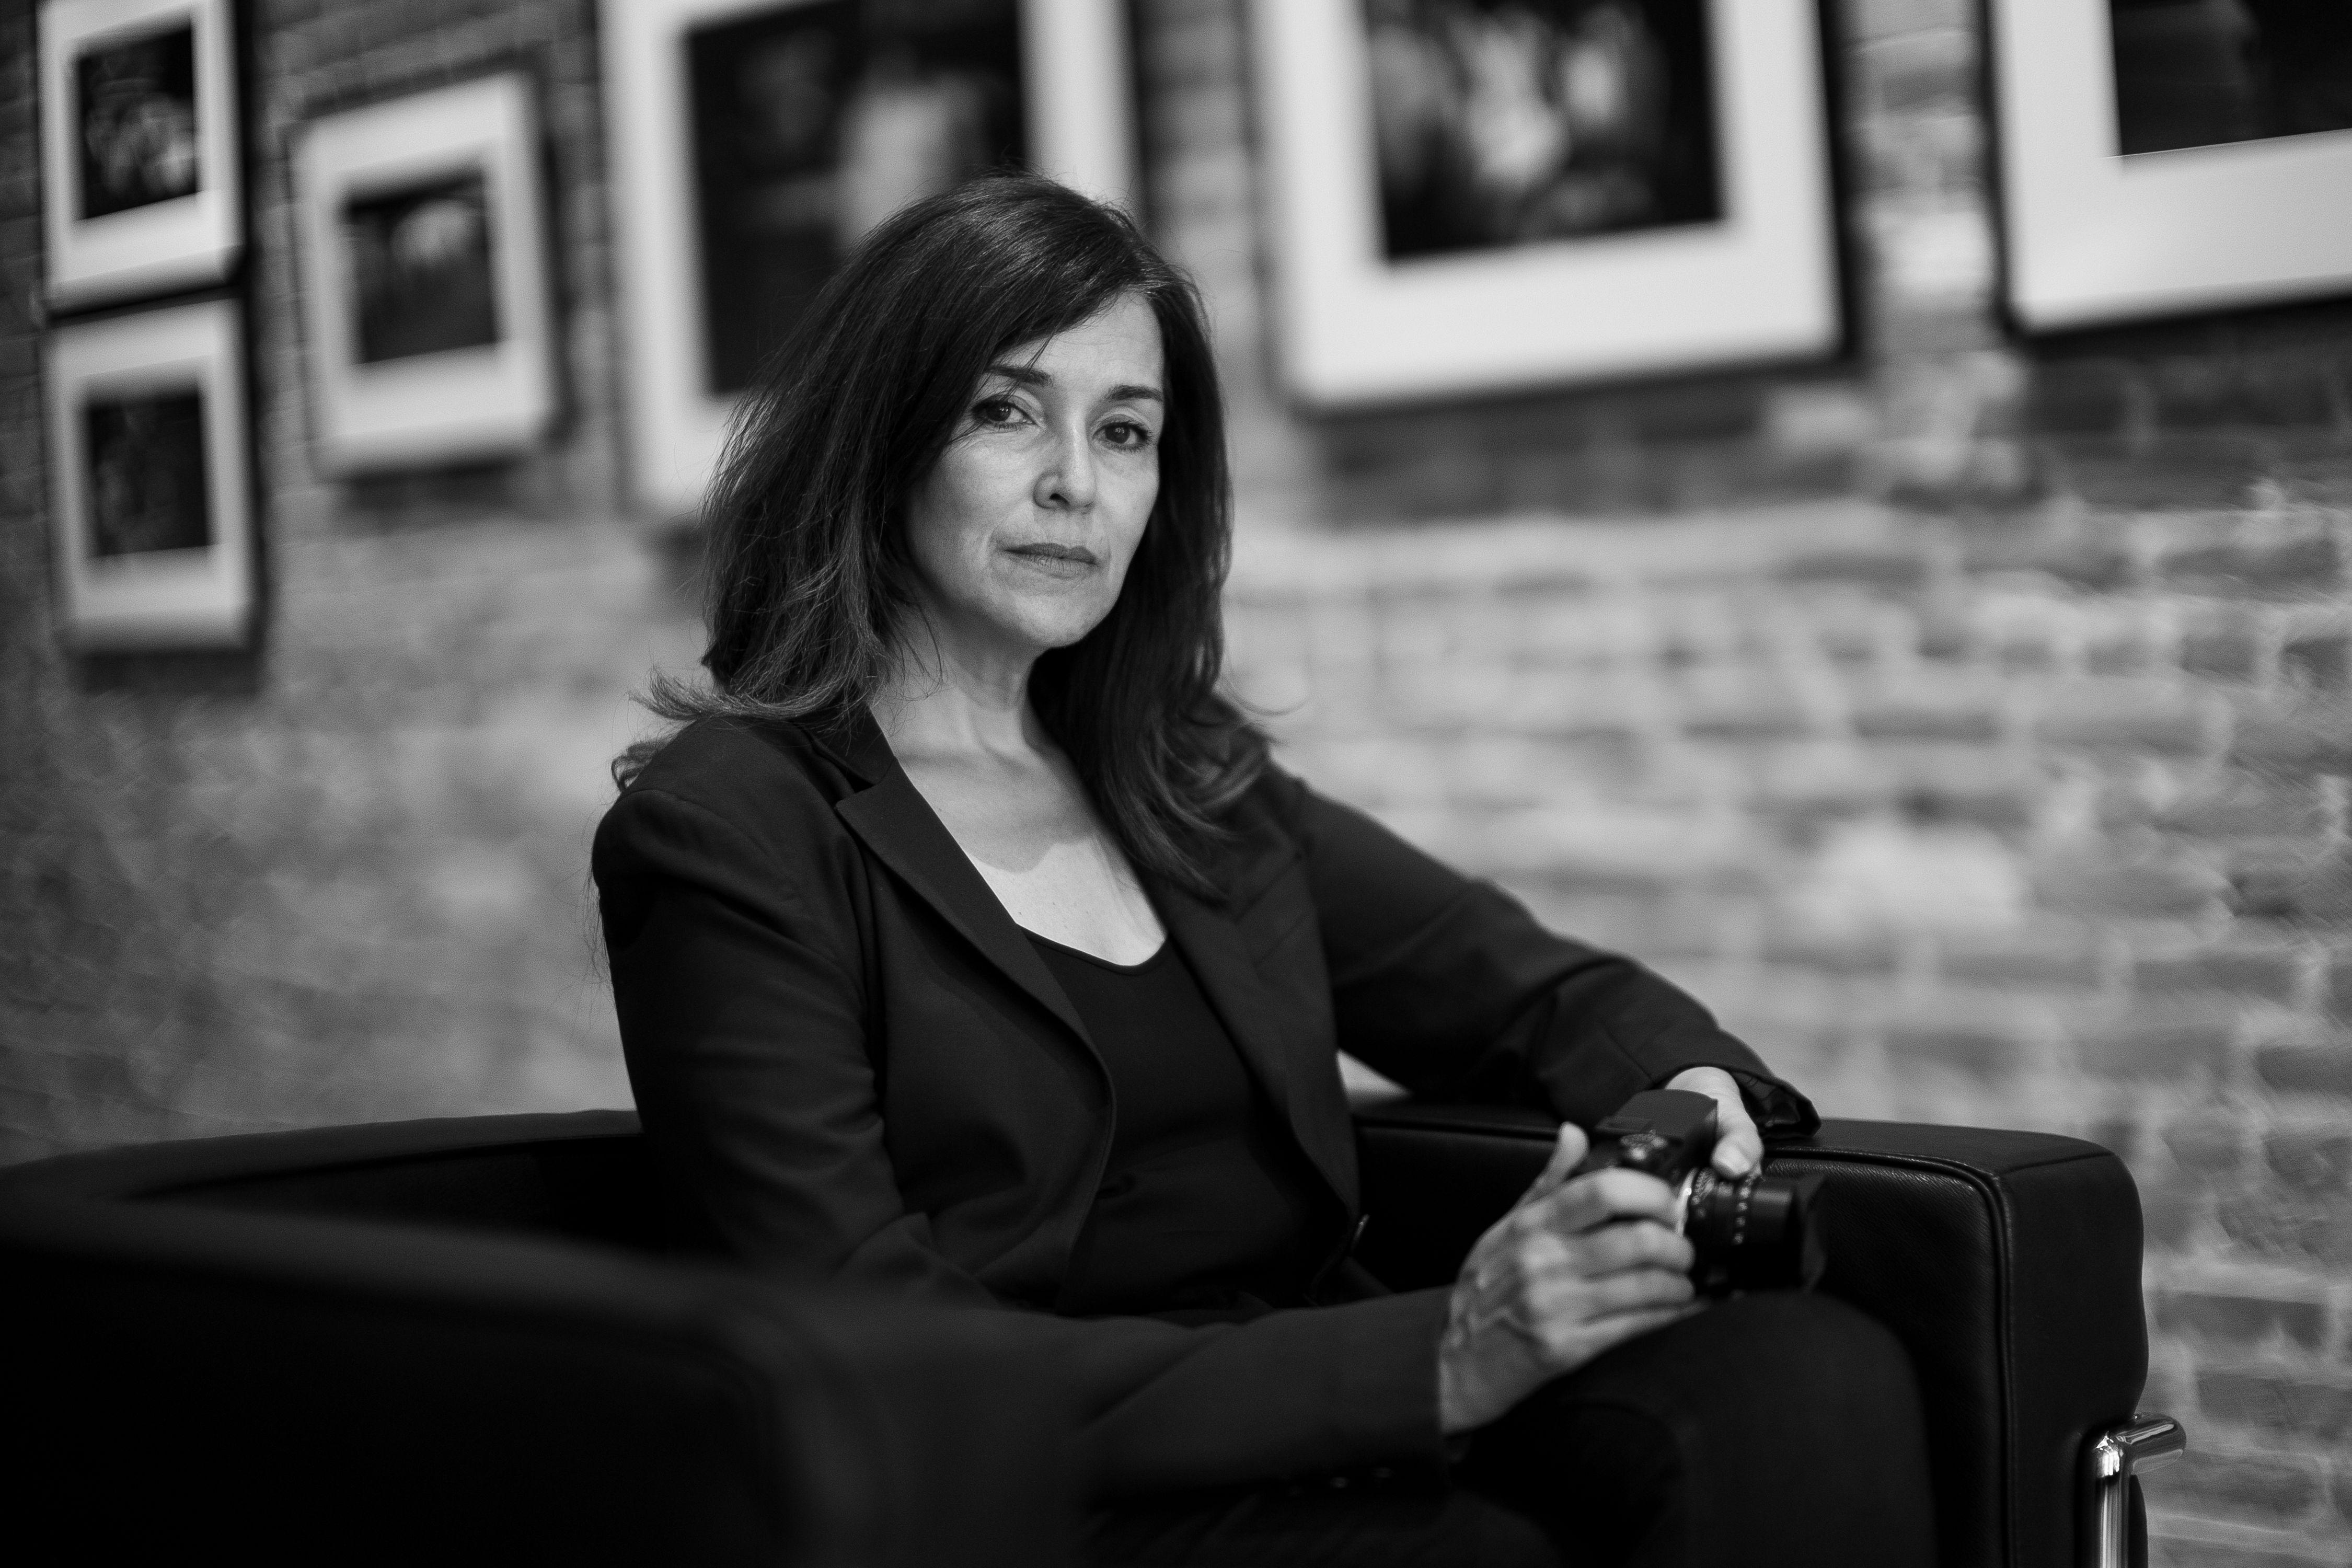 Darcy Padilla, Photographer Agence VU.